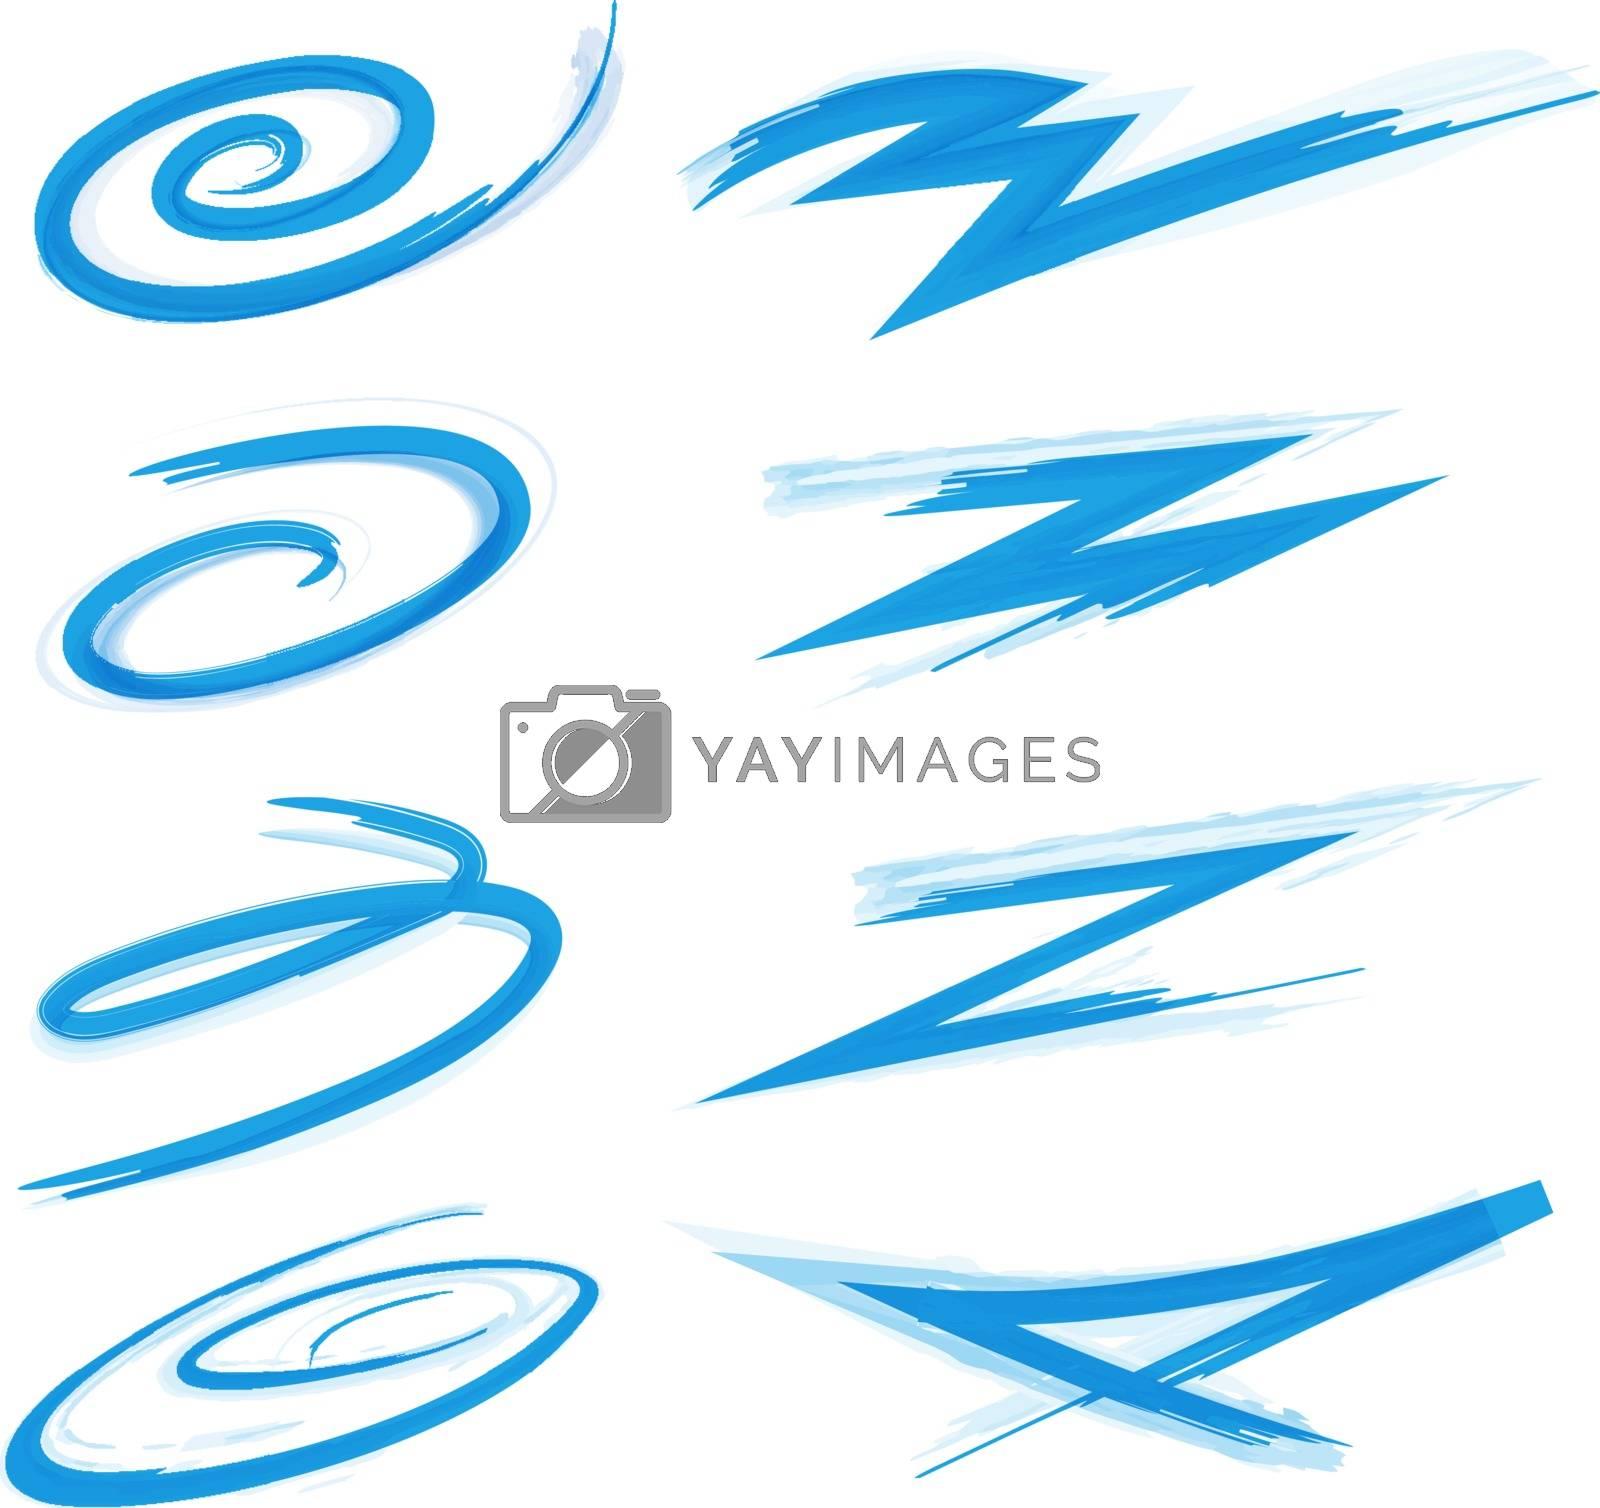 Abstract swirl swoosh and graffiti stroke elements set. Vector illustration